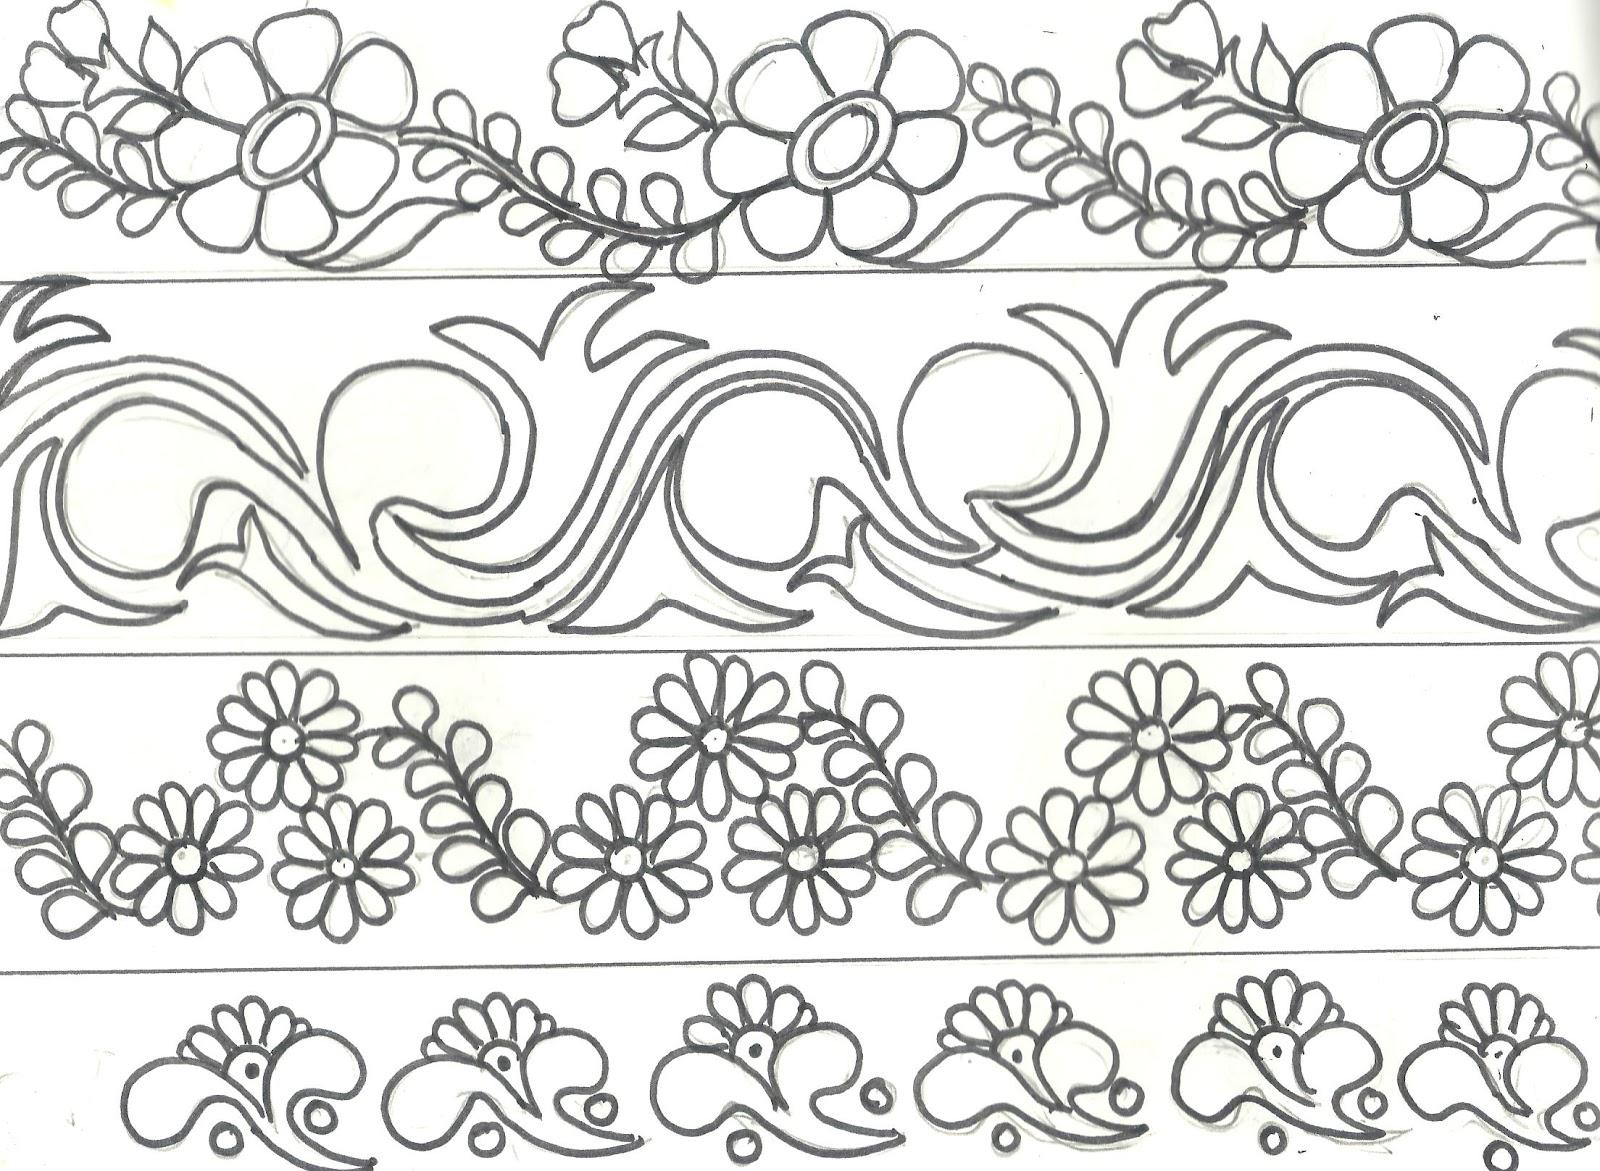 Art n craft latest border designs